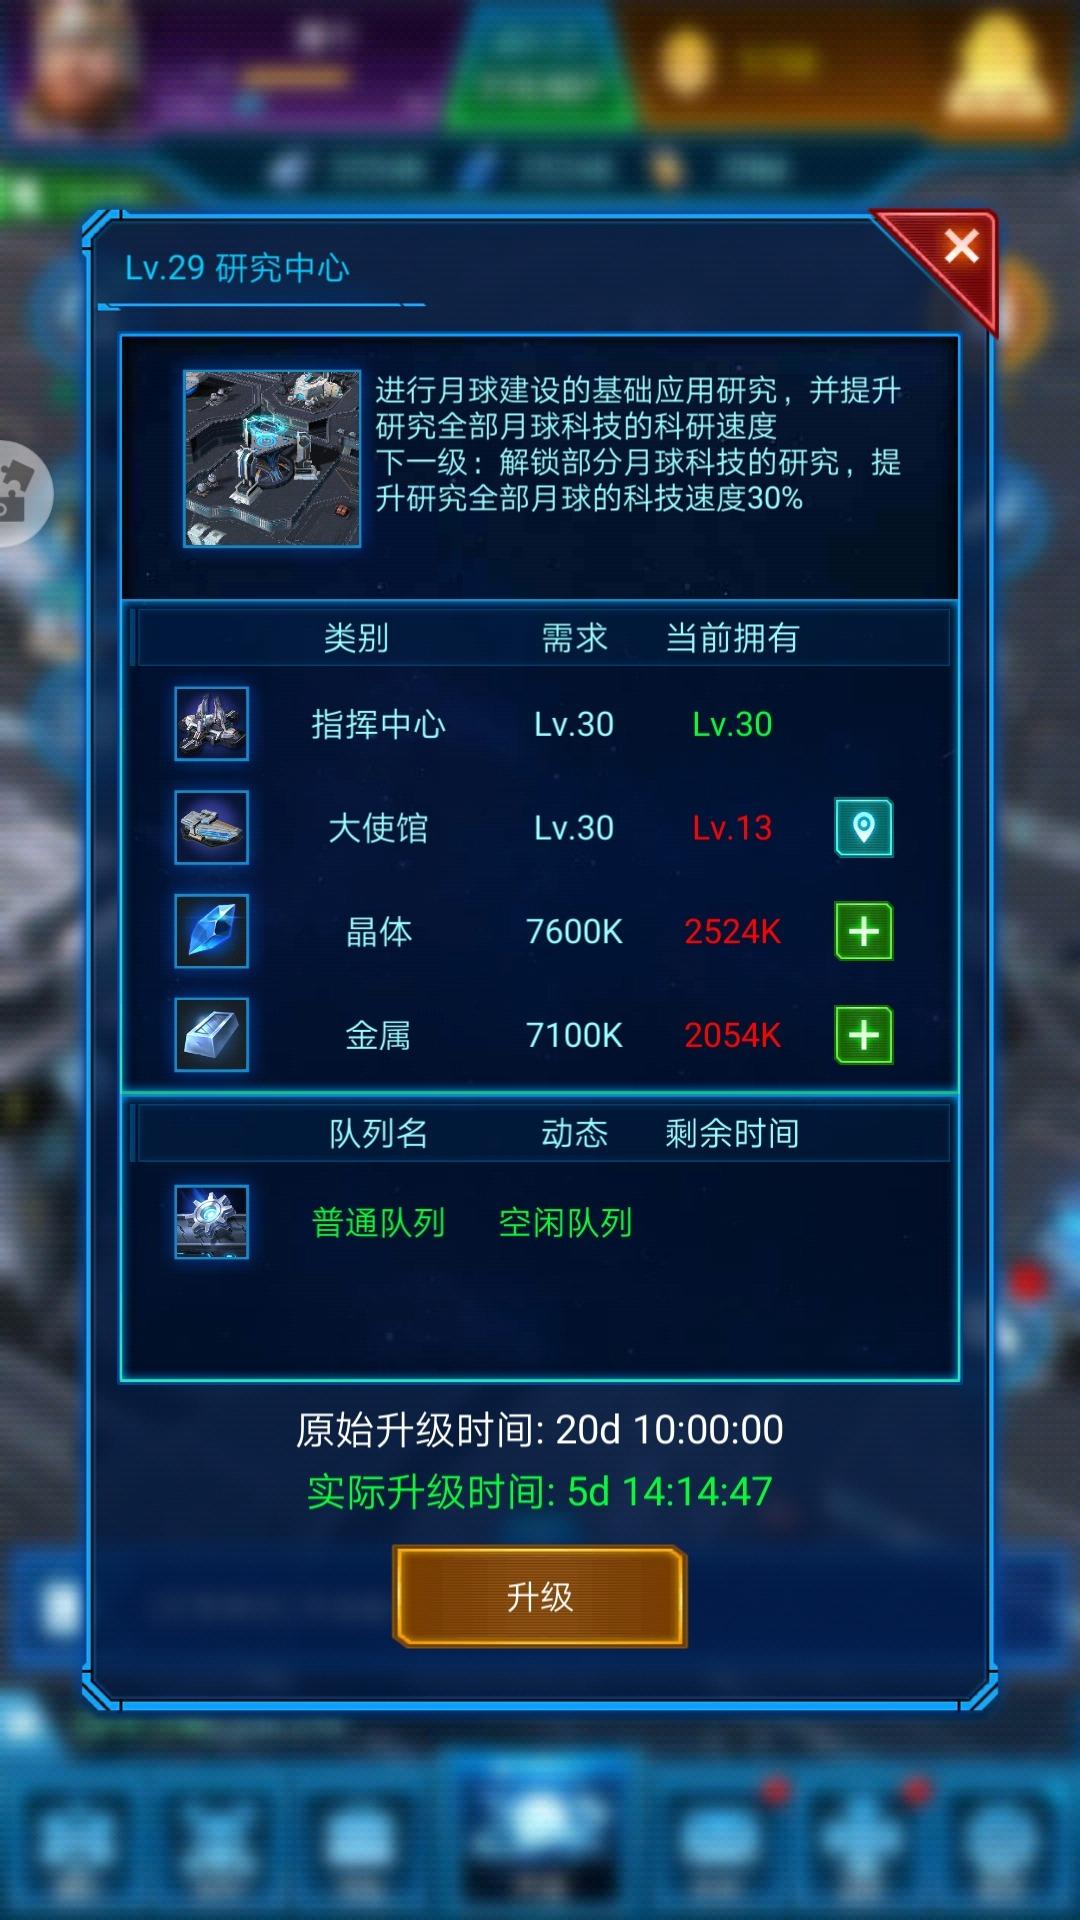 Screenshot_20191113_194157_com.jedigames.p16s.huawei.jpg